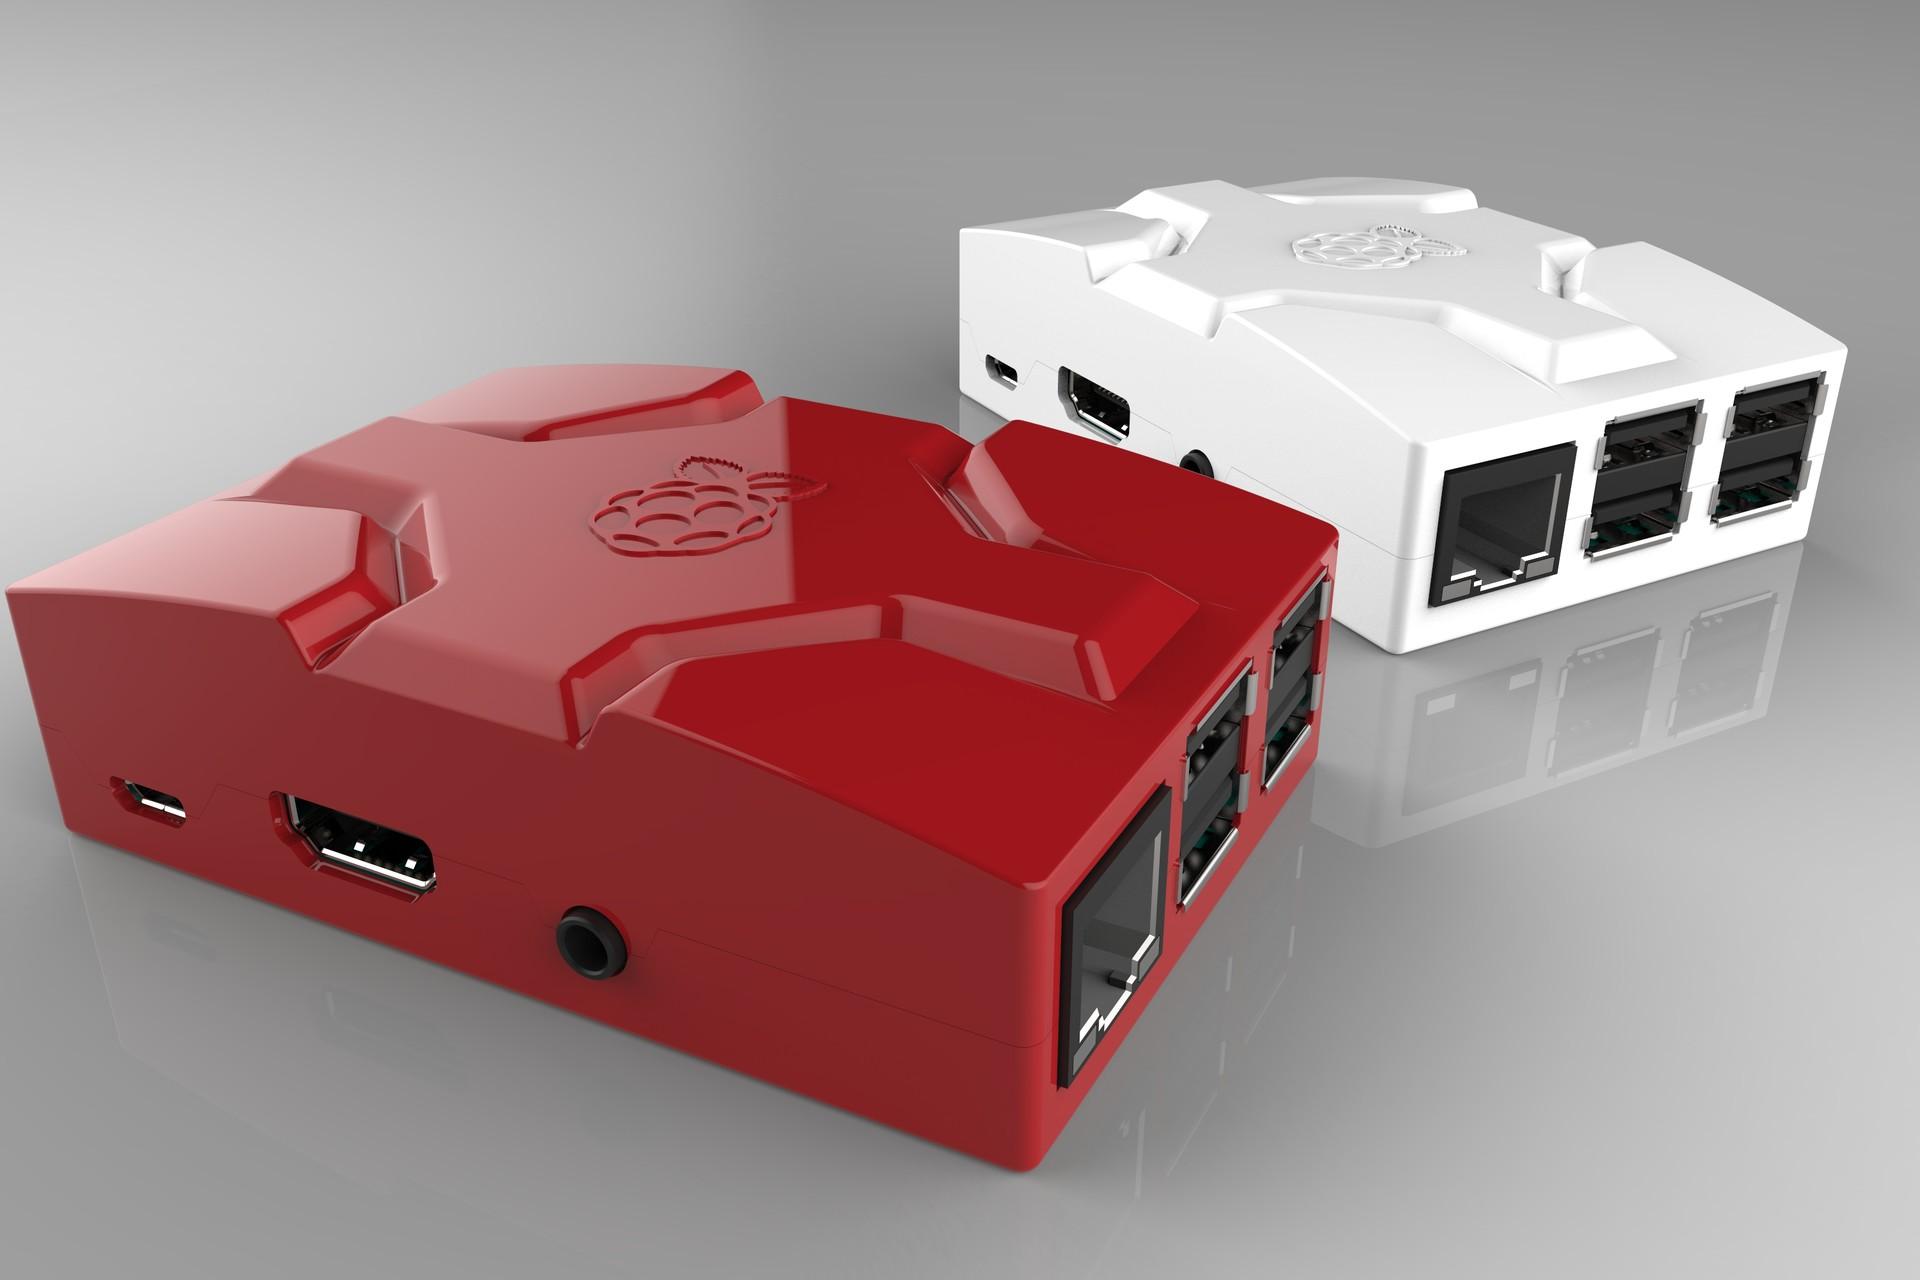 Dmitrii Buriachek - PCB enclosure design Raspberry Pi B+